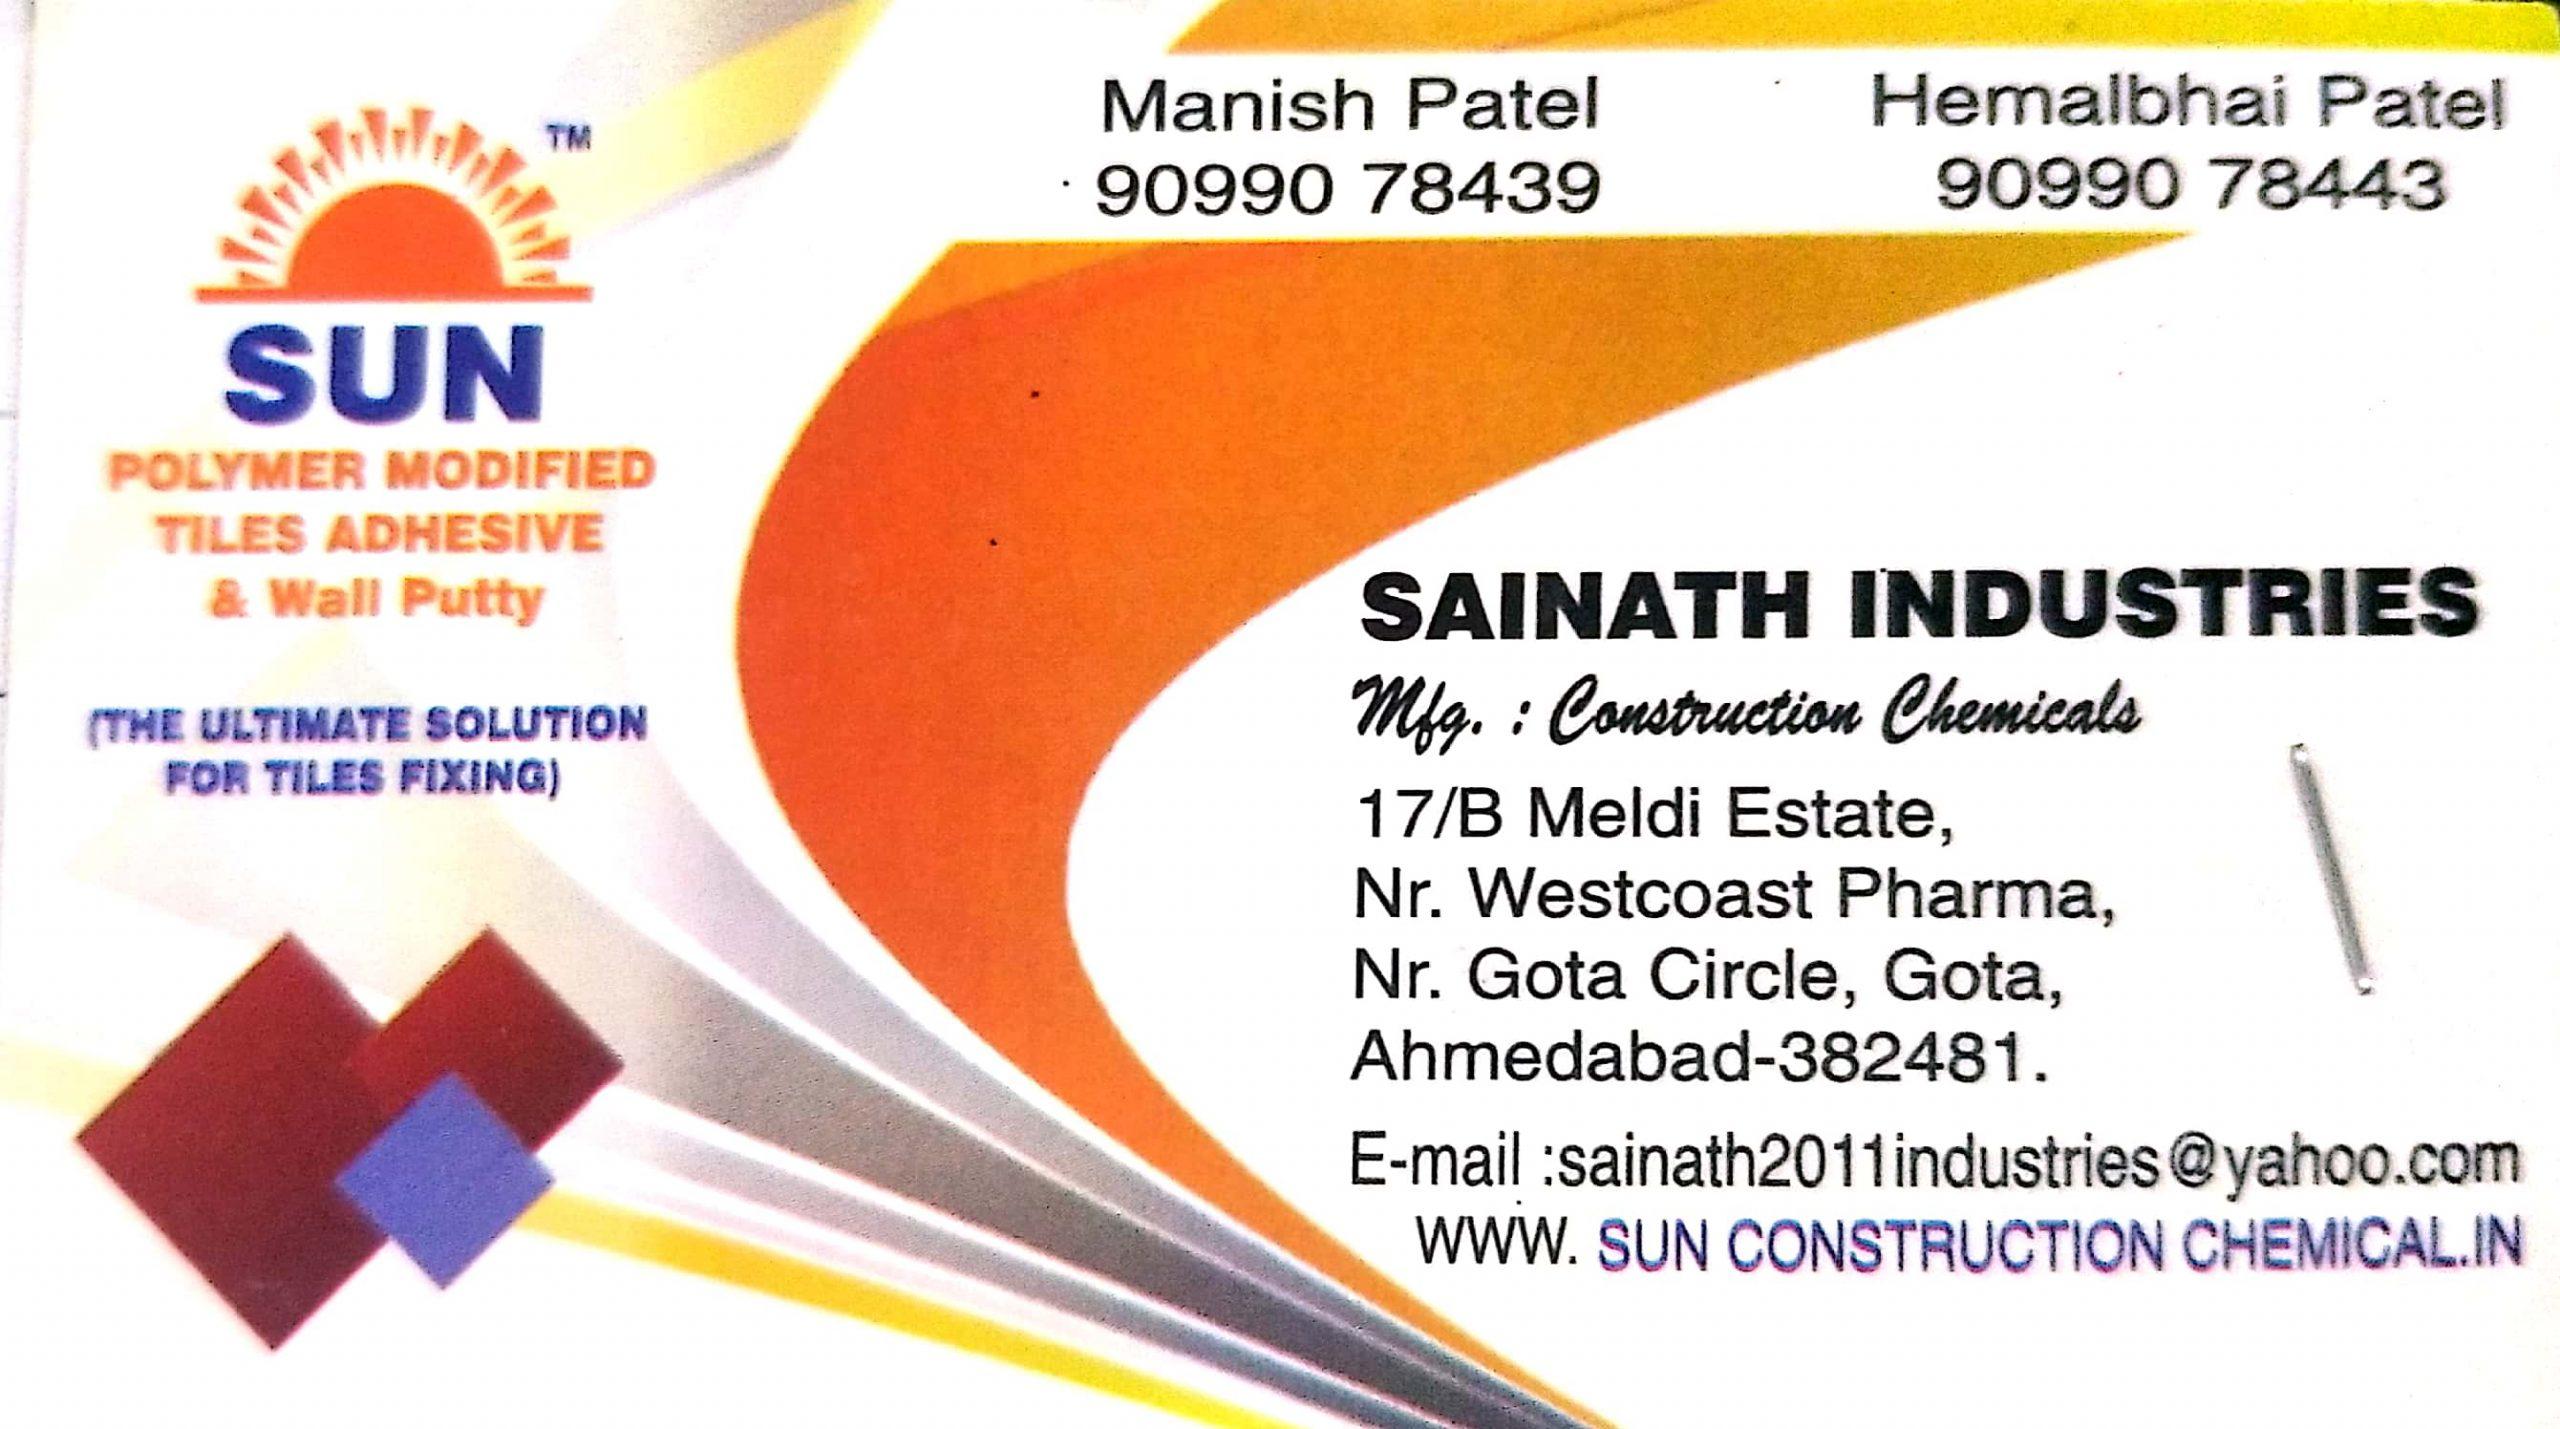 Sainath Industries